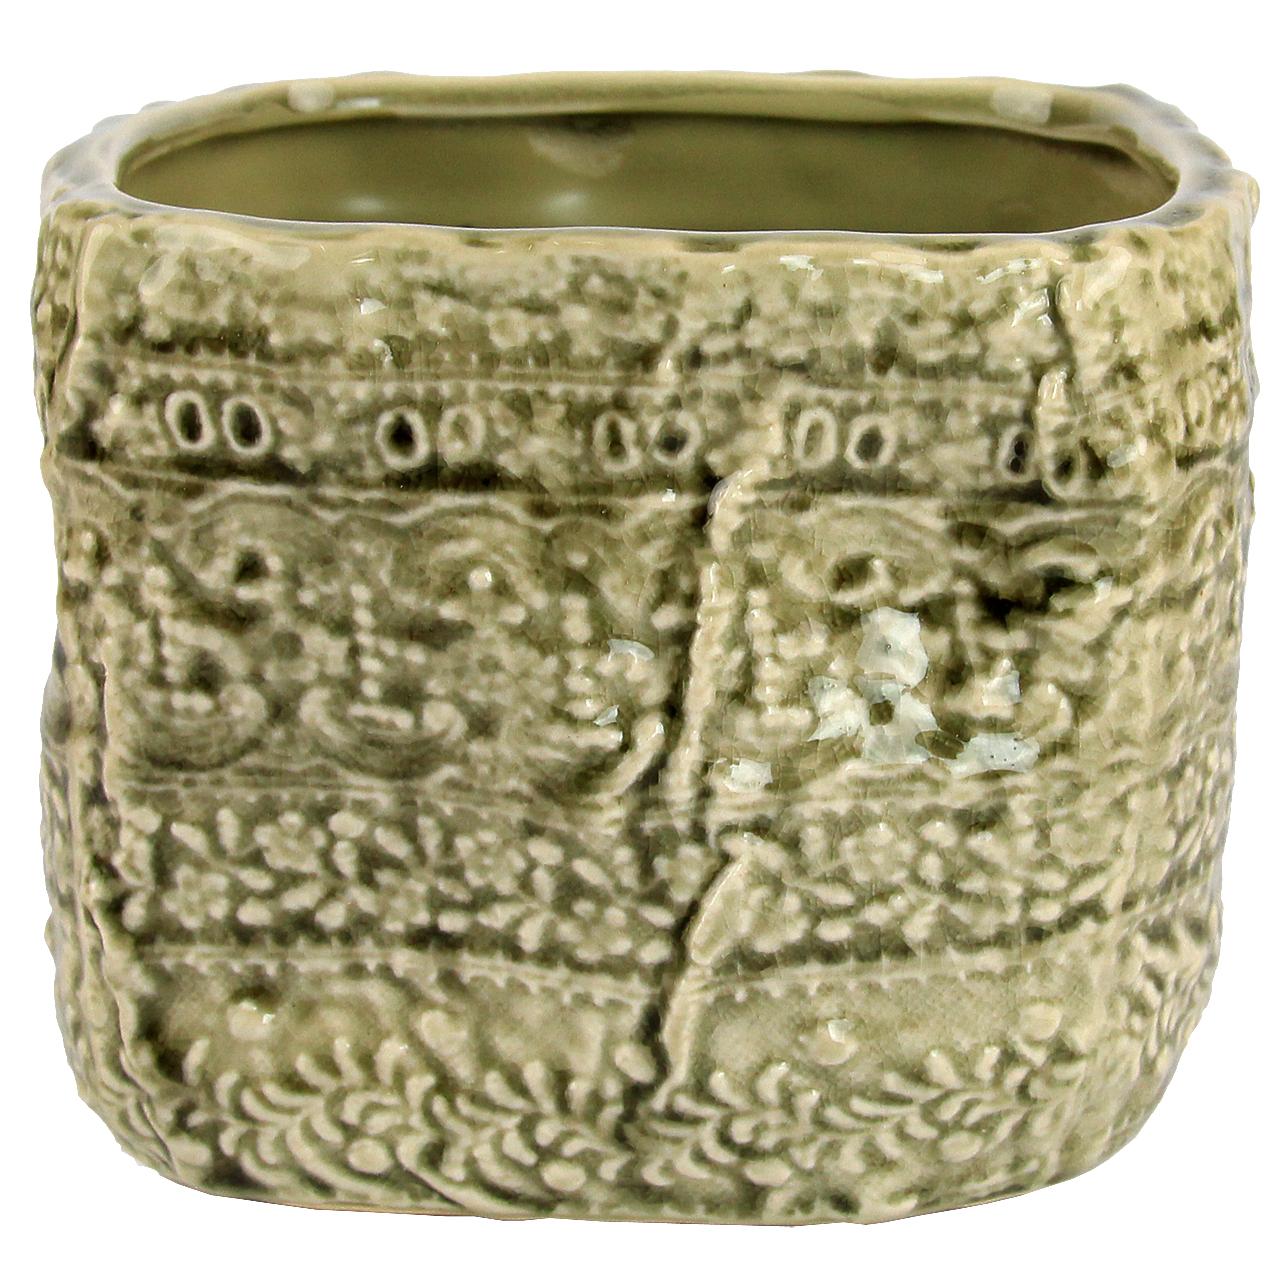 Ghiveci Din Ceramica Crem 11 Cm